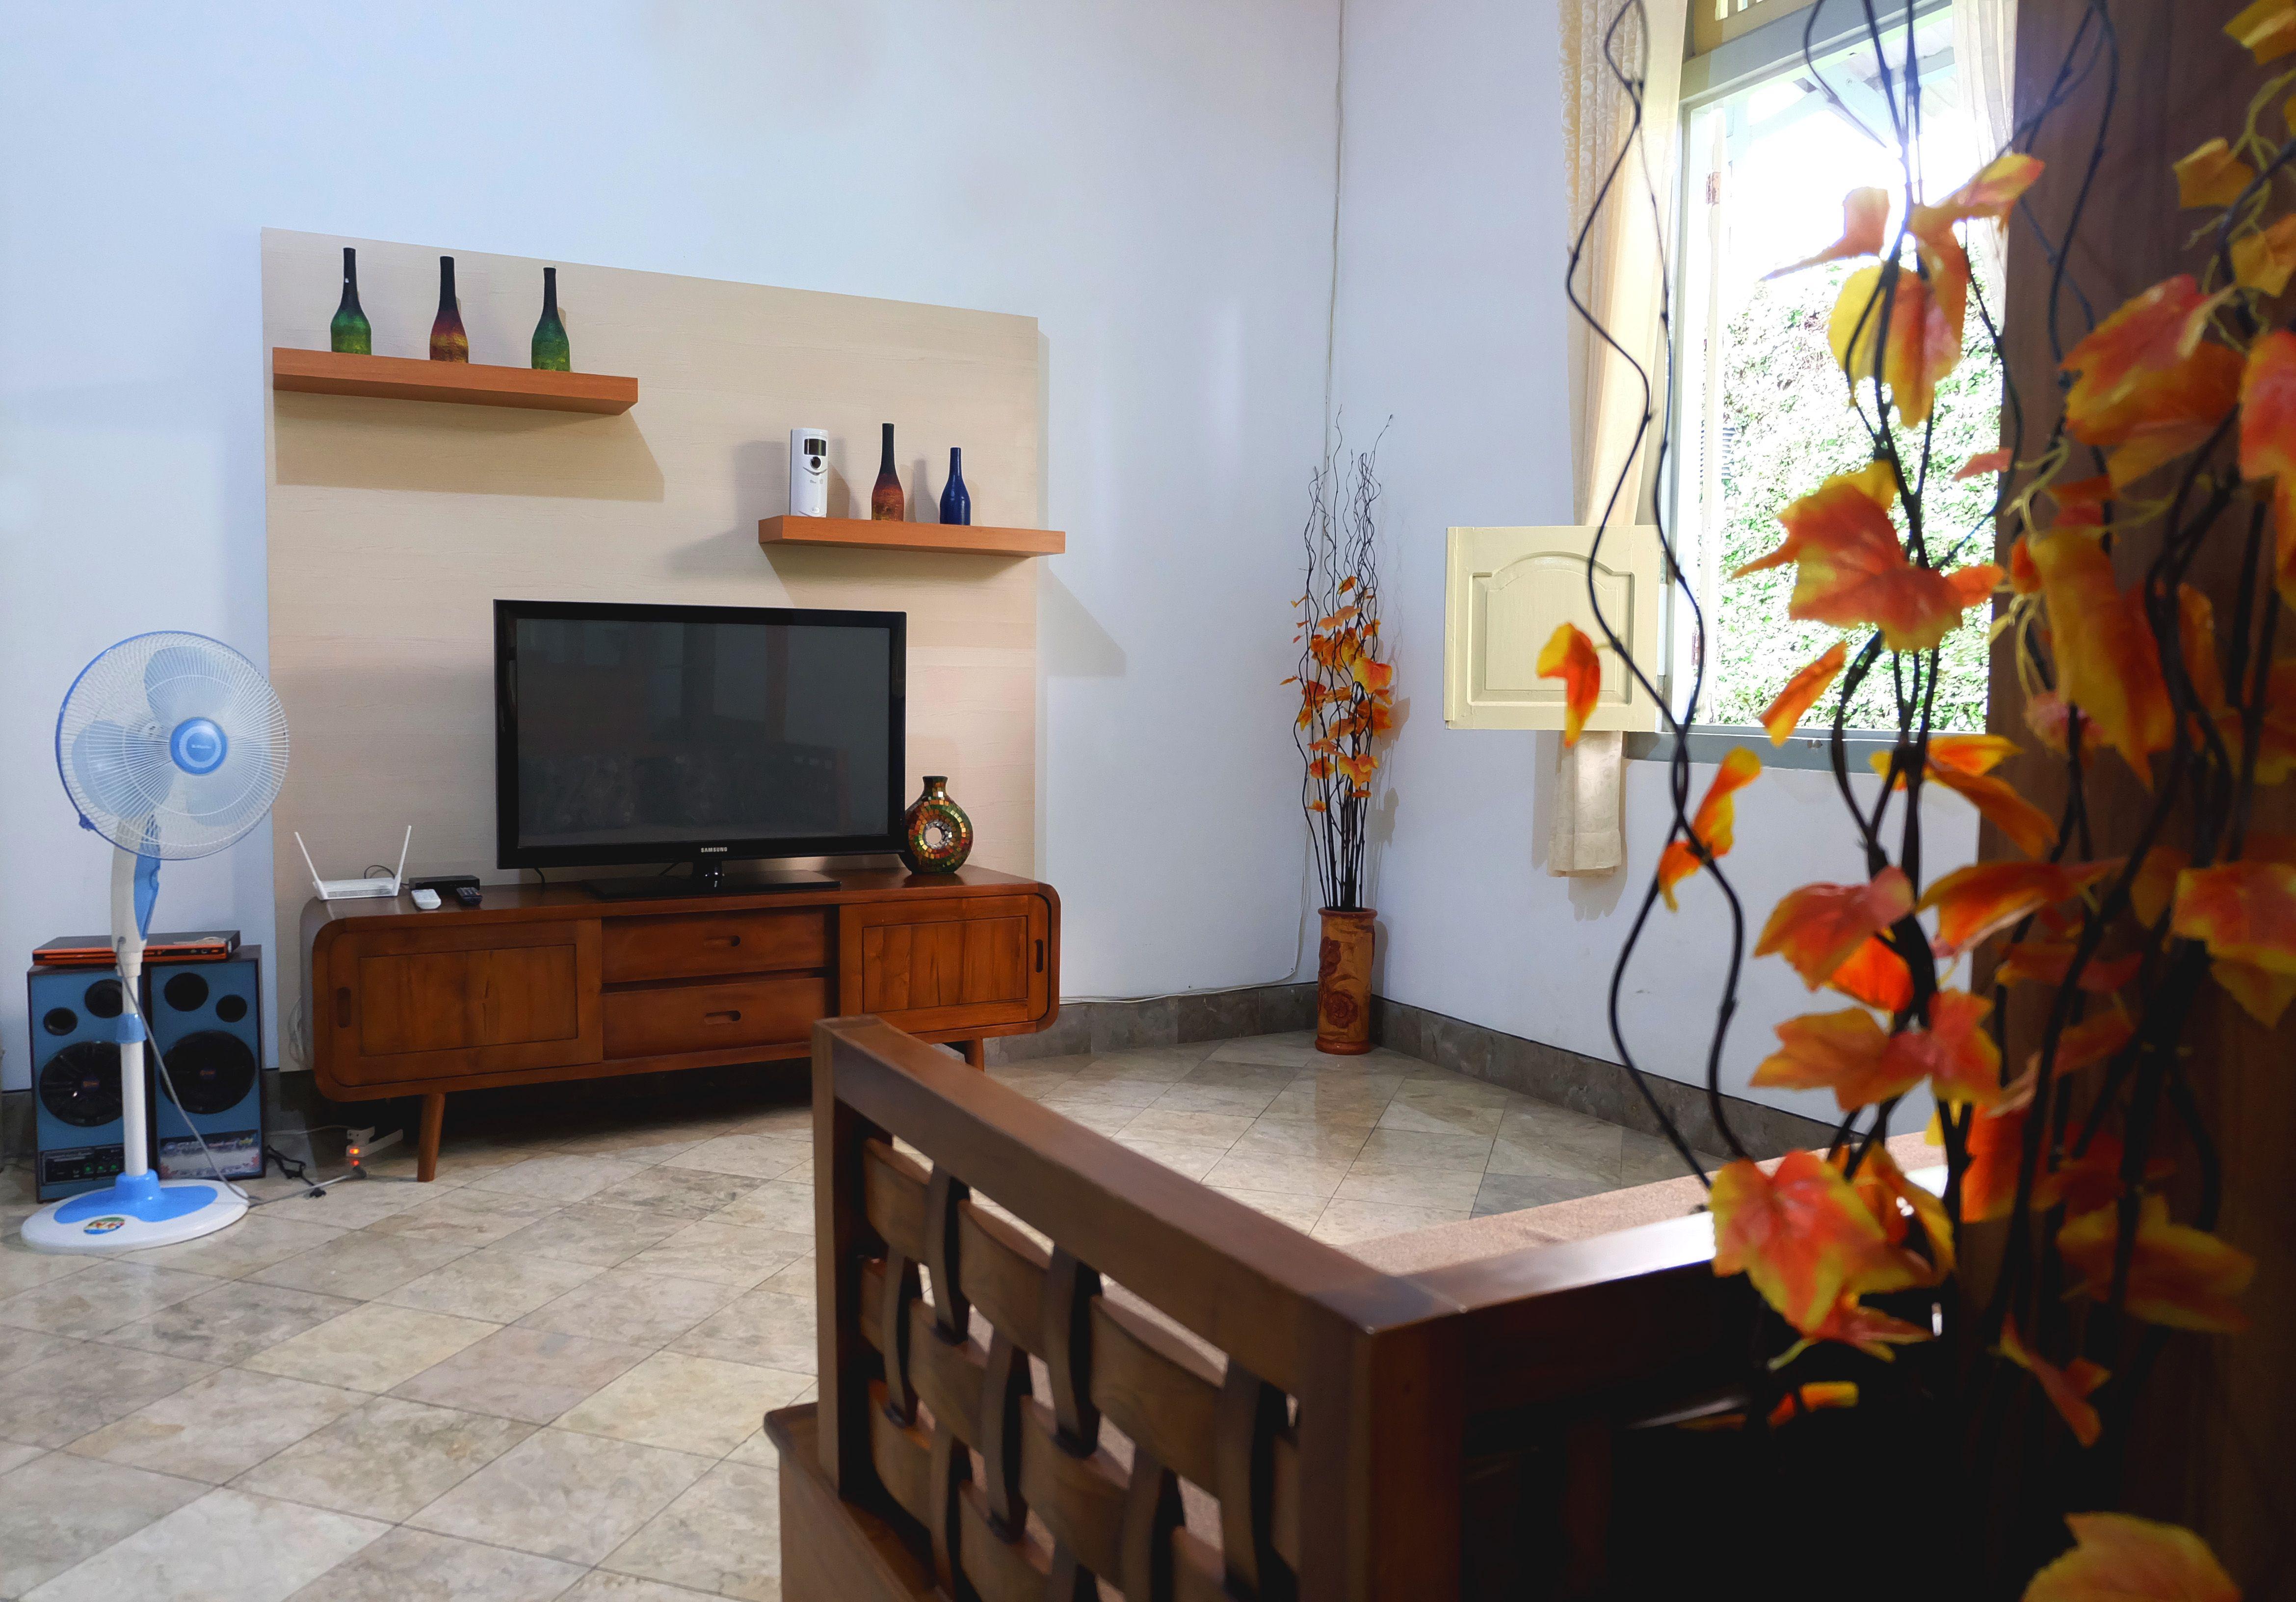 Simply Homy Guest House Malioboro 1, Yogyakarta